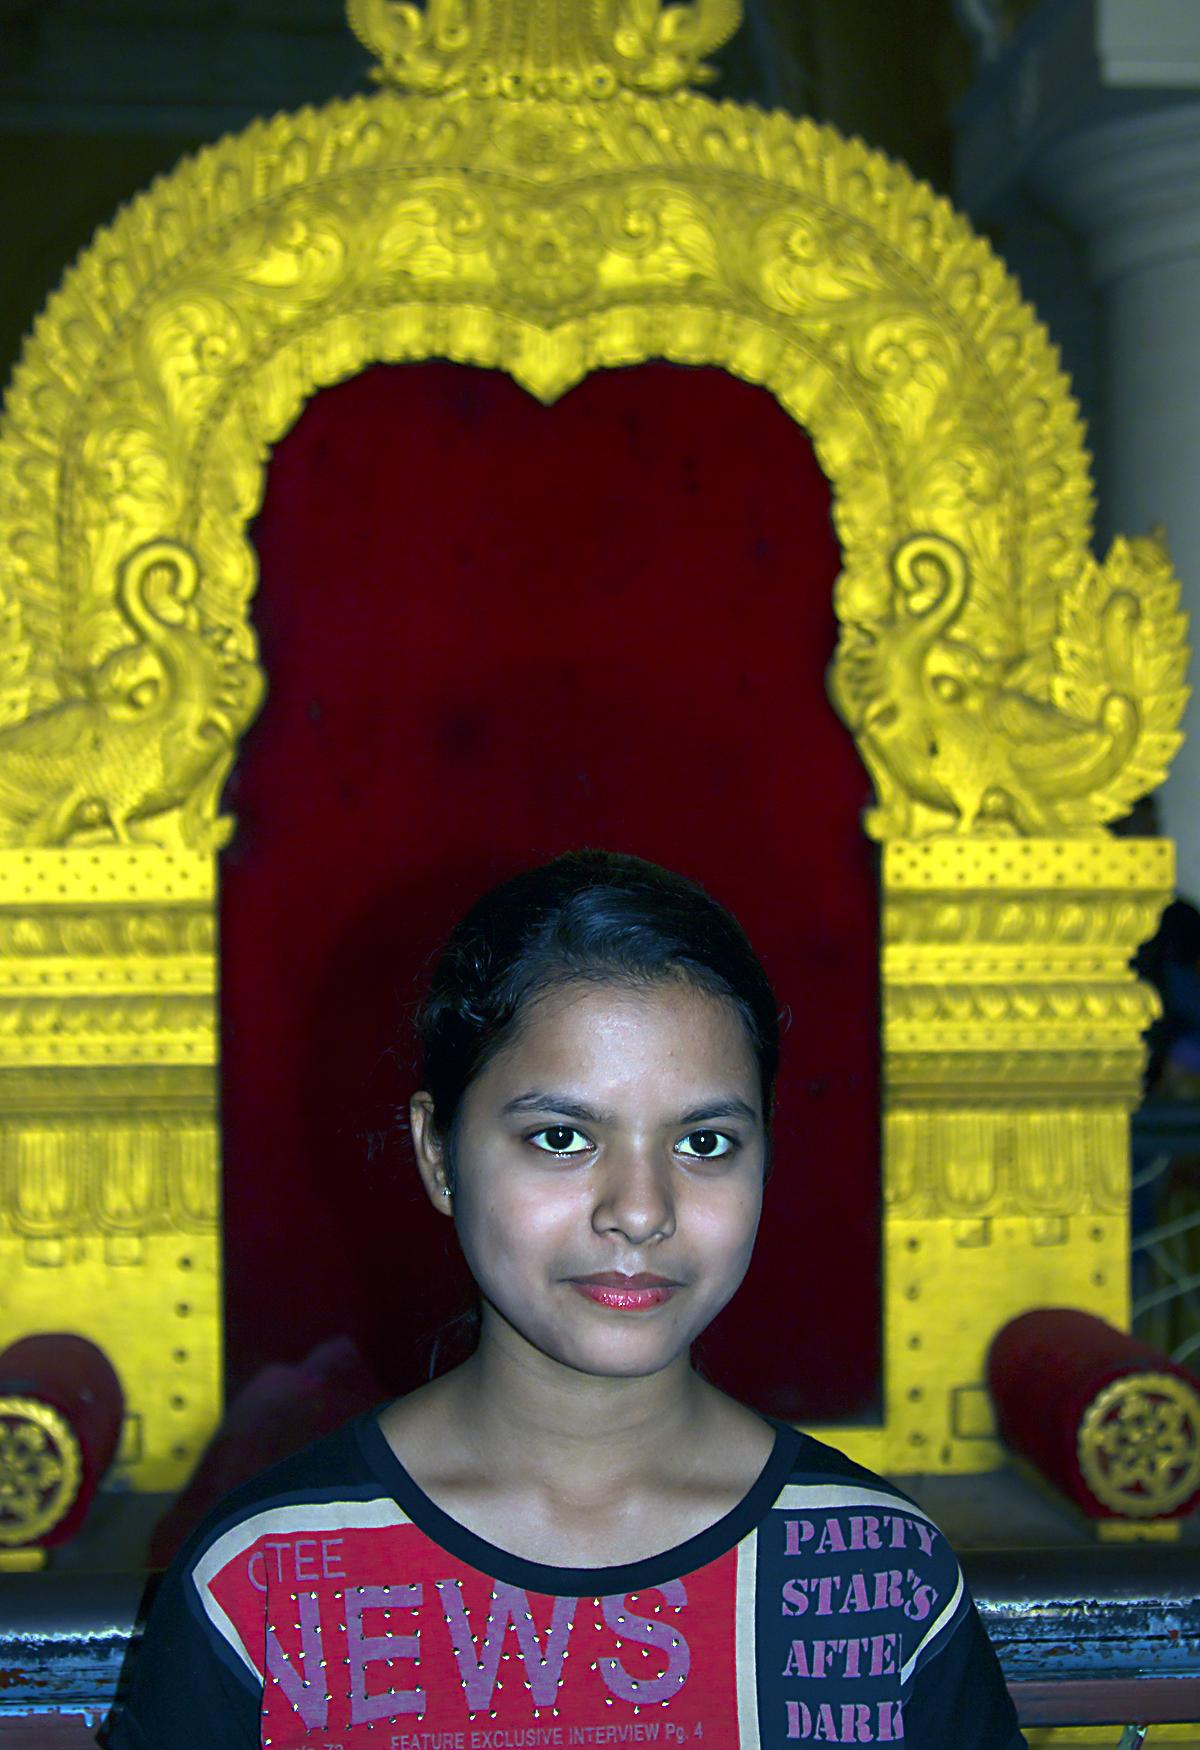 INDIEN Chennai Kanchipuram Tempel Menschen Tempel FINEST-onTour 7736-2.jpg